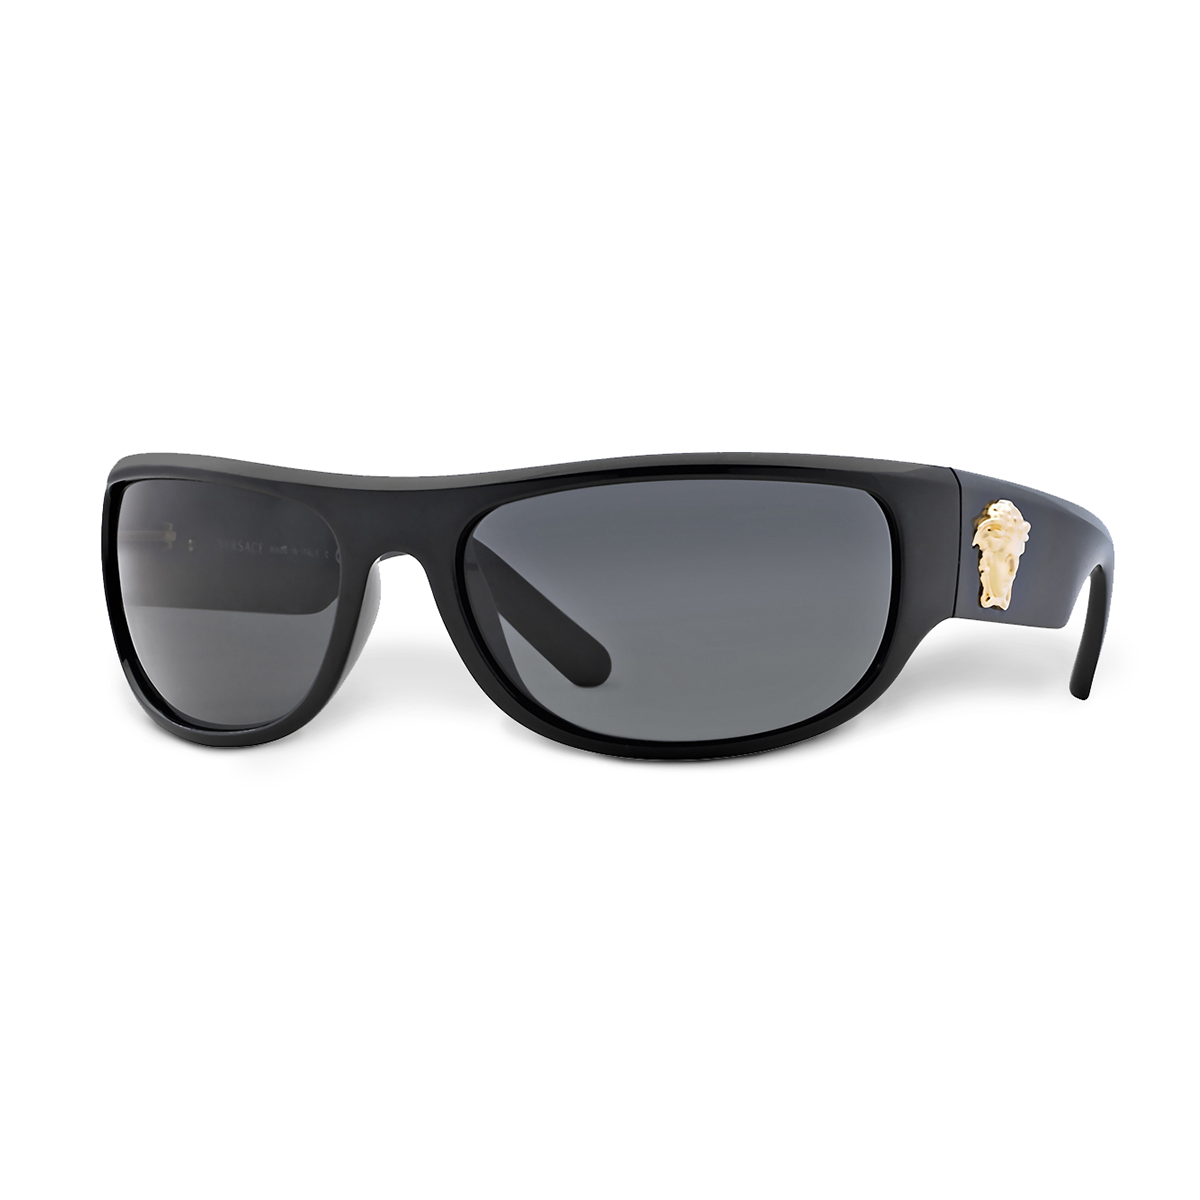 e05c45af1d4 Transgressive iconic appeal - black wrap-around sunglasses. Find more   Versace Men s SS15 sunglasses on versace.com…